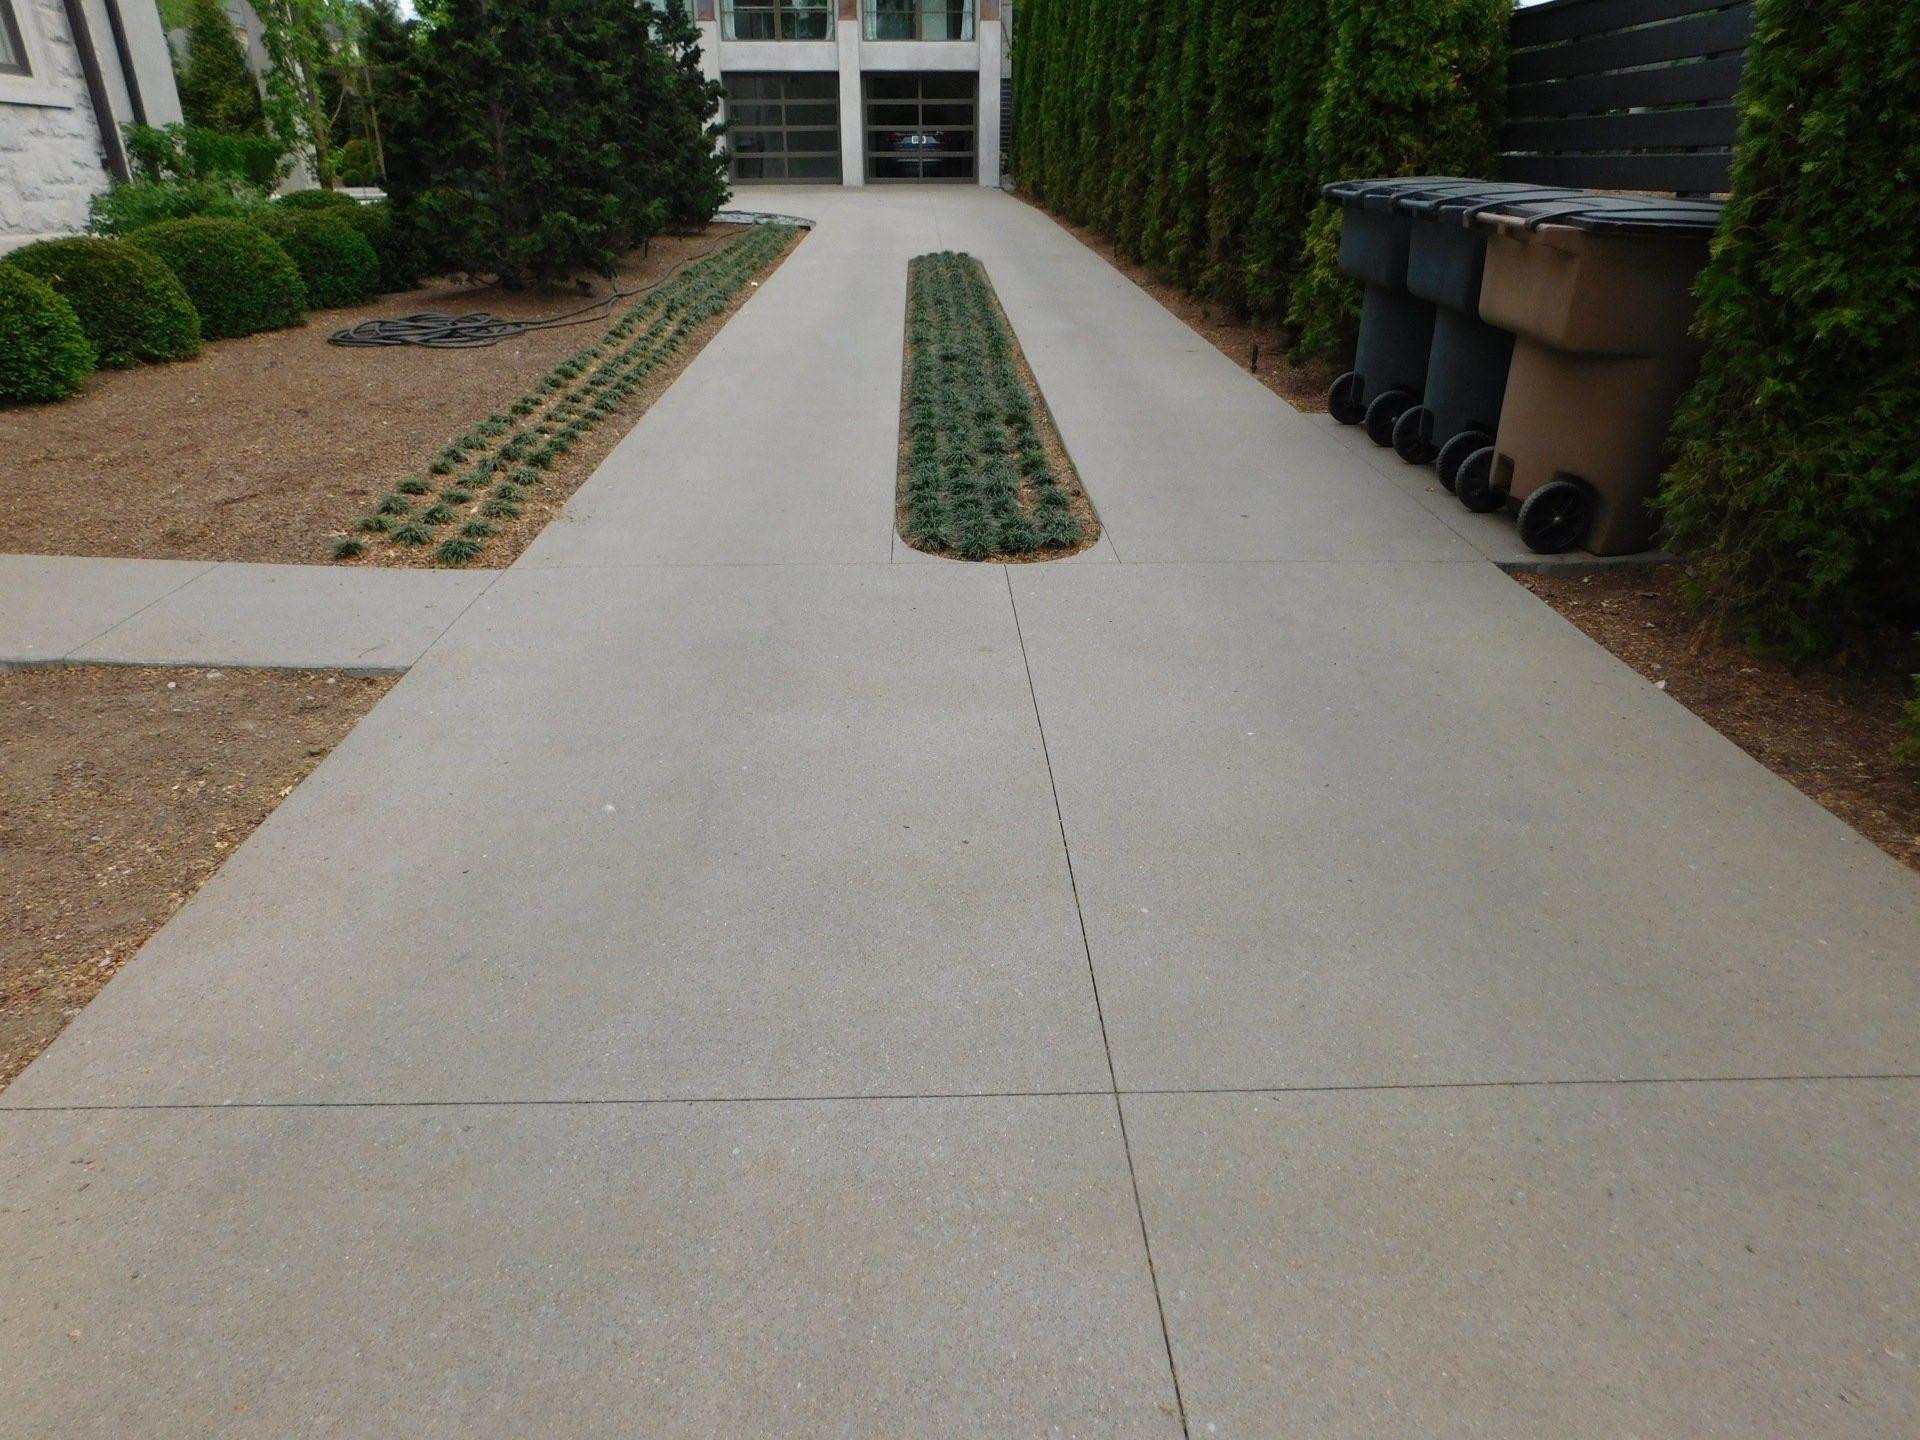 15 Top Cast Finish Concrete Driveway Color Pewter Greystone Modern Driveway Decor Driveway Landscaping Decorative Concrete Driveways Concrete Driveways